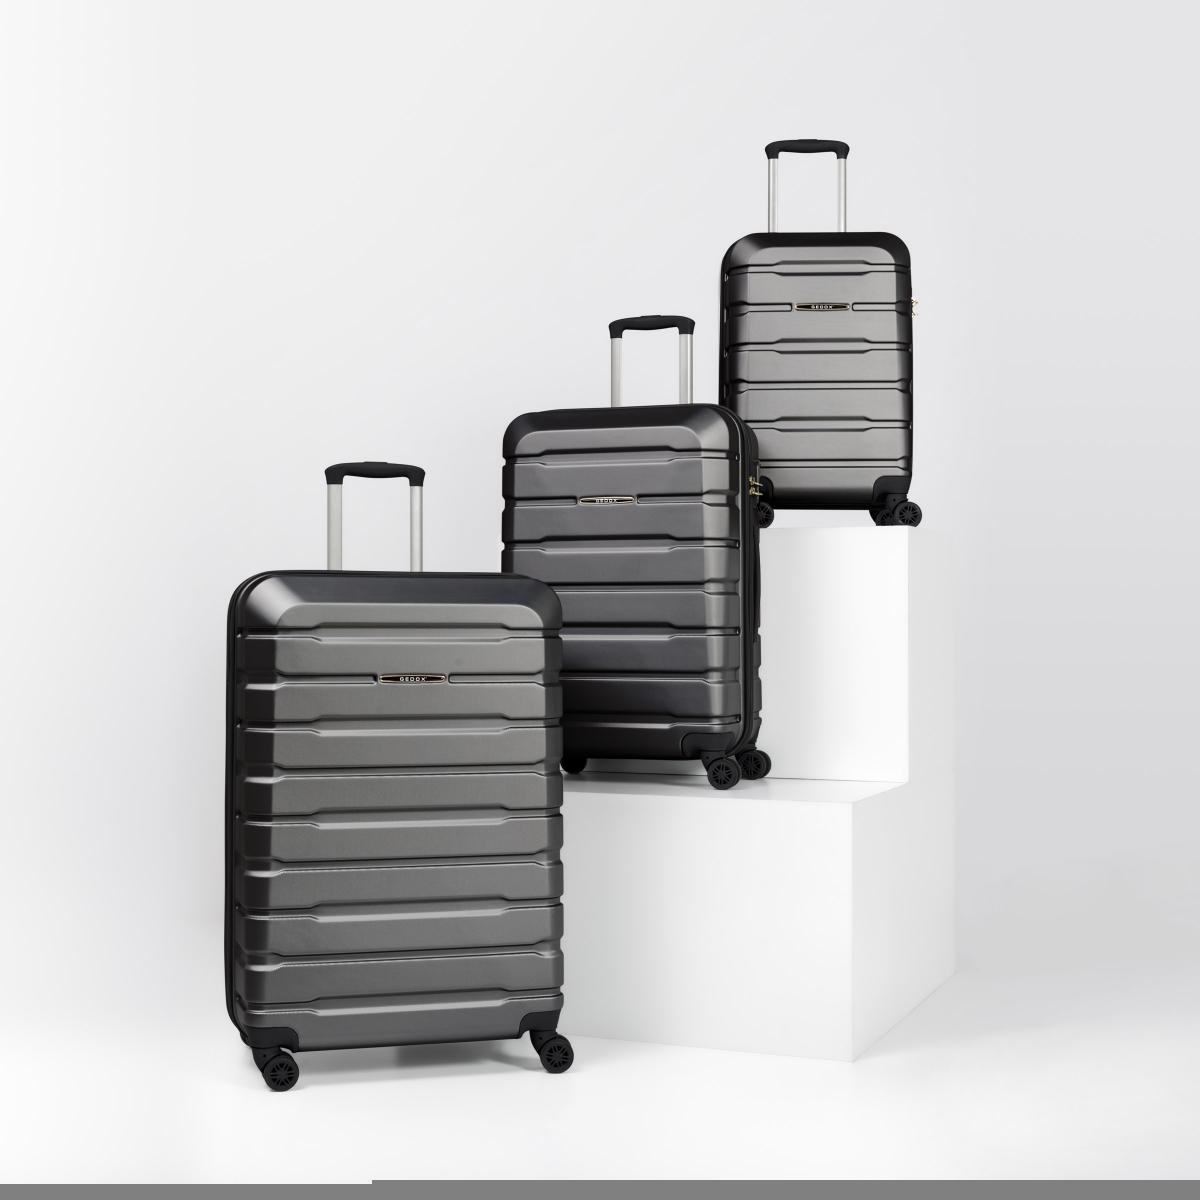 Gedox Abs Premium Tonaton 3'lü Valiz Seyahat Seti - Model:500.02 Koyu Gri